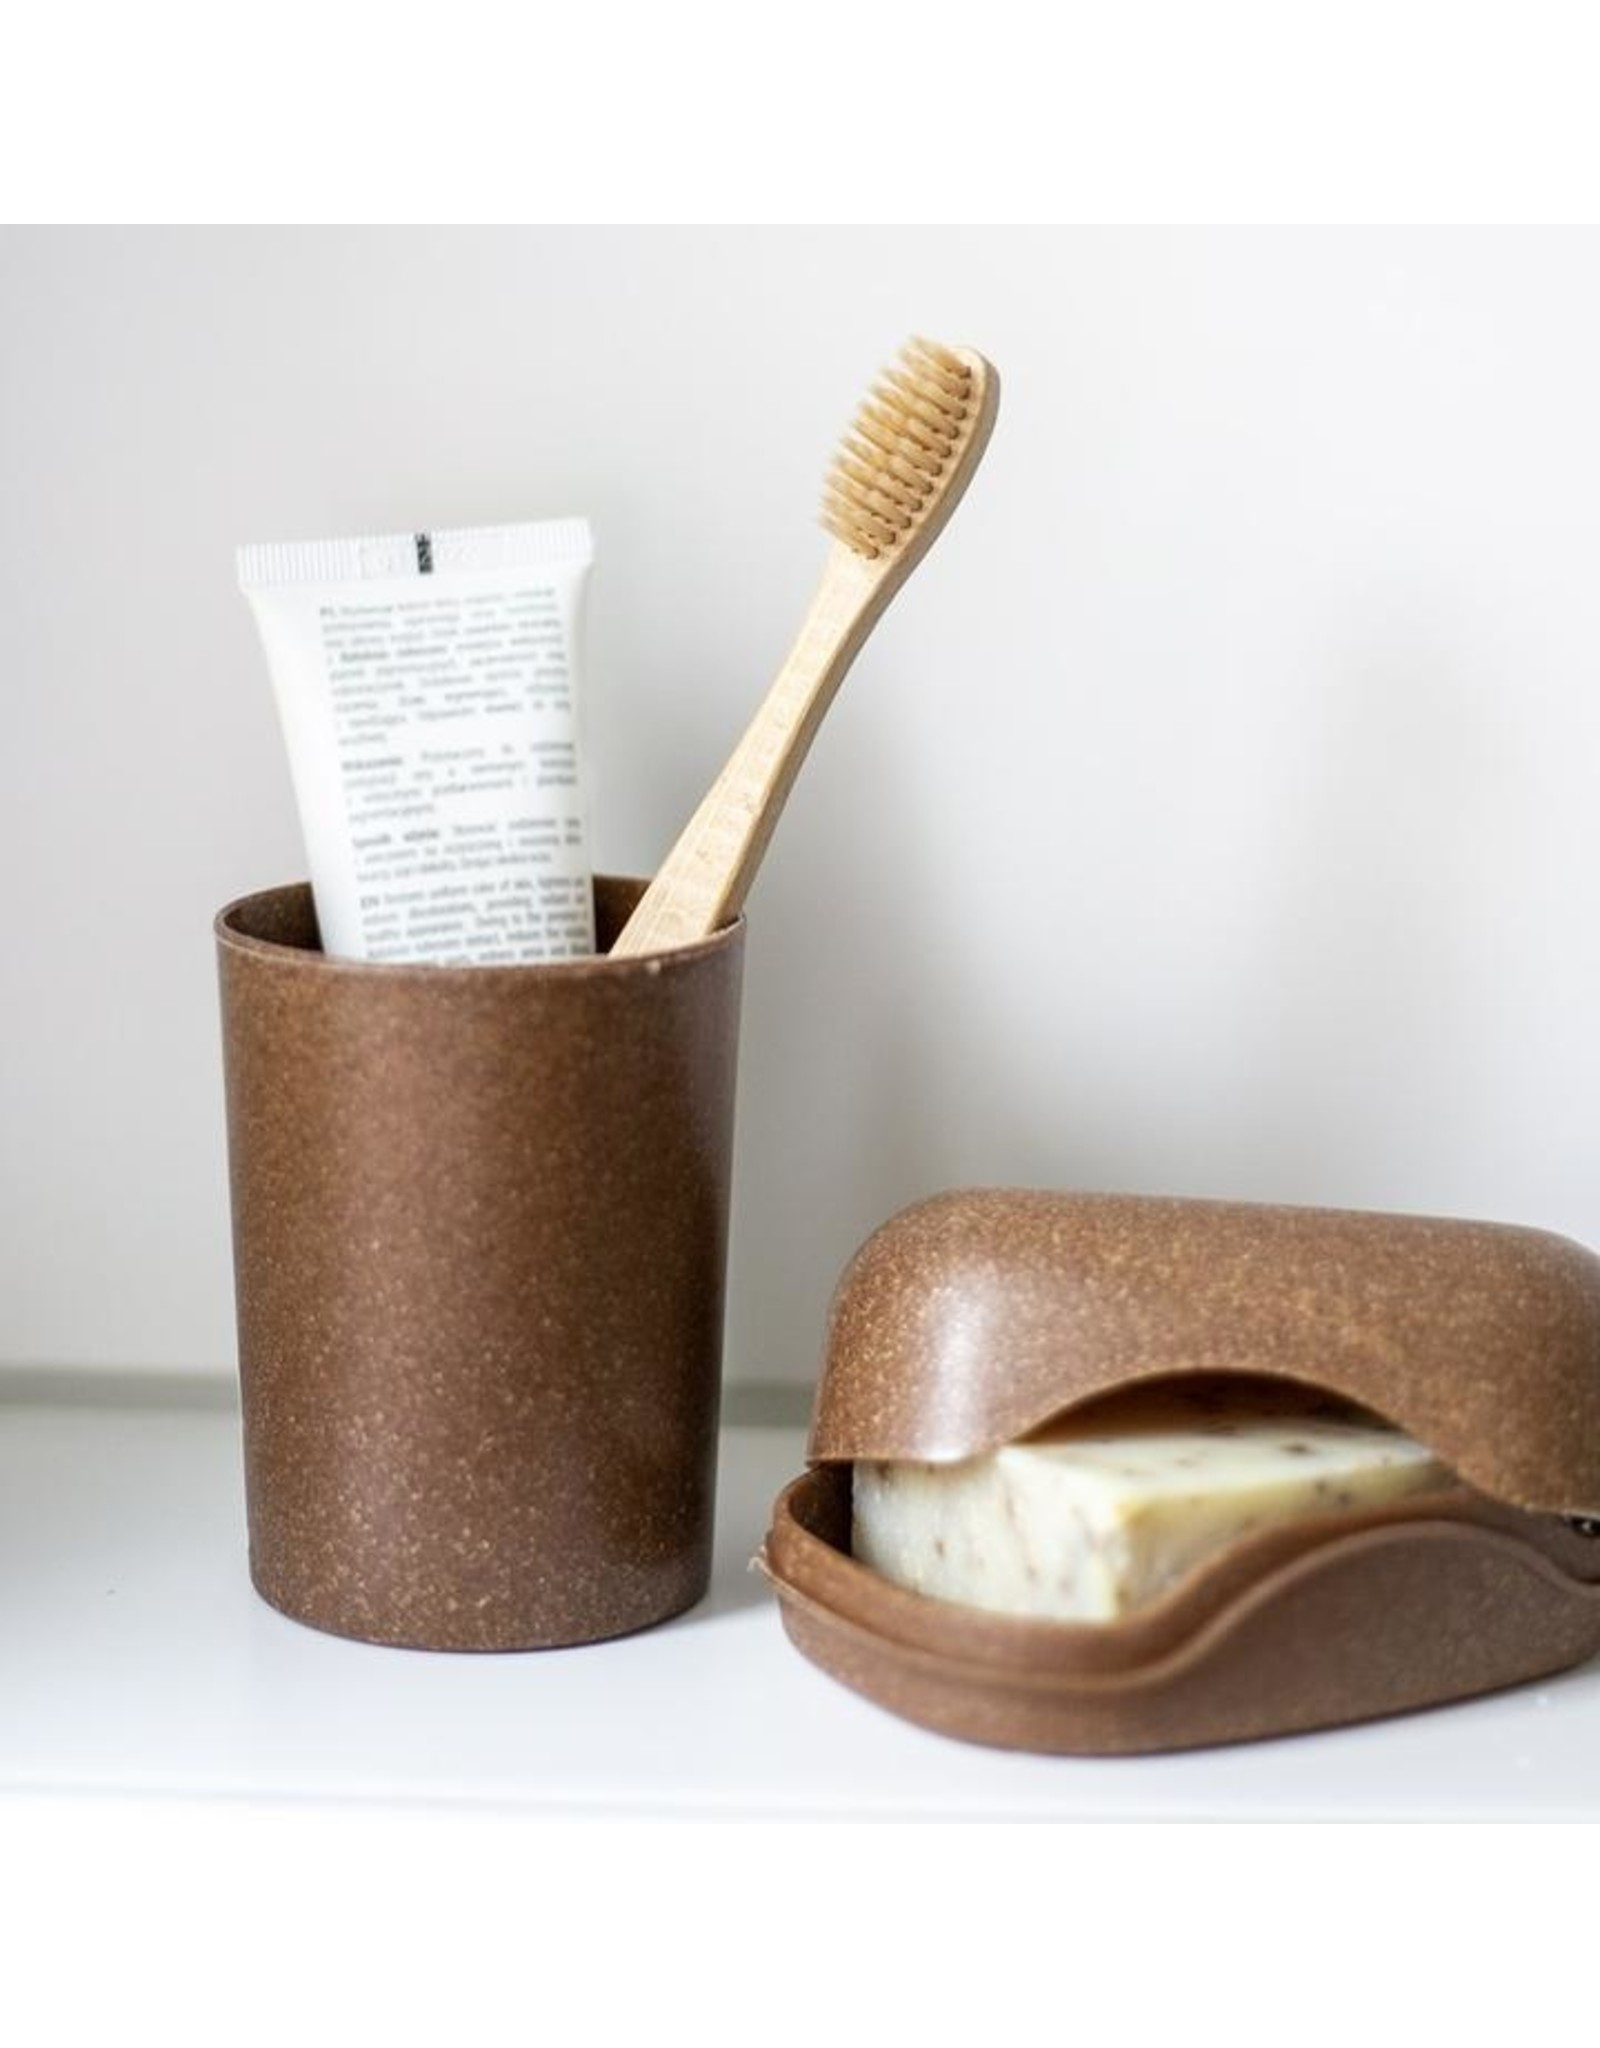 CROLL & DENECKE Boîte à savon en hêtre